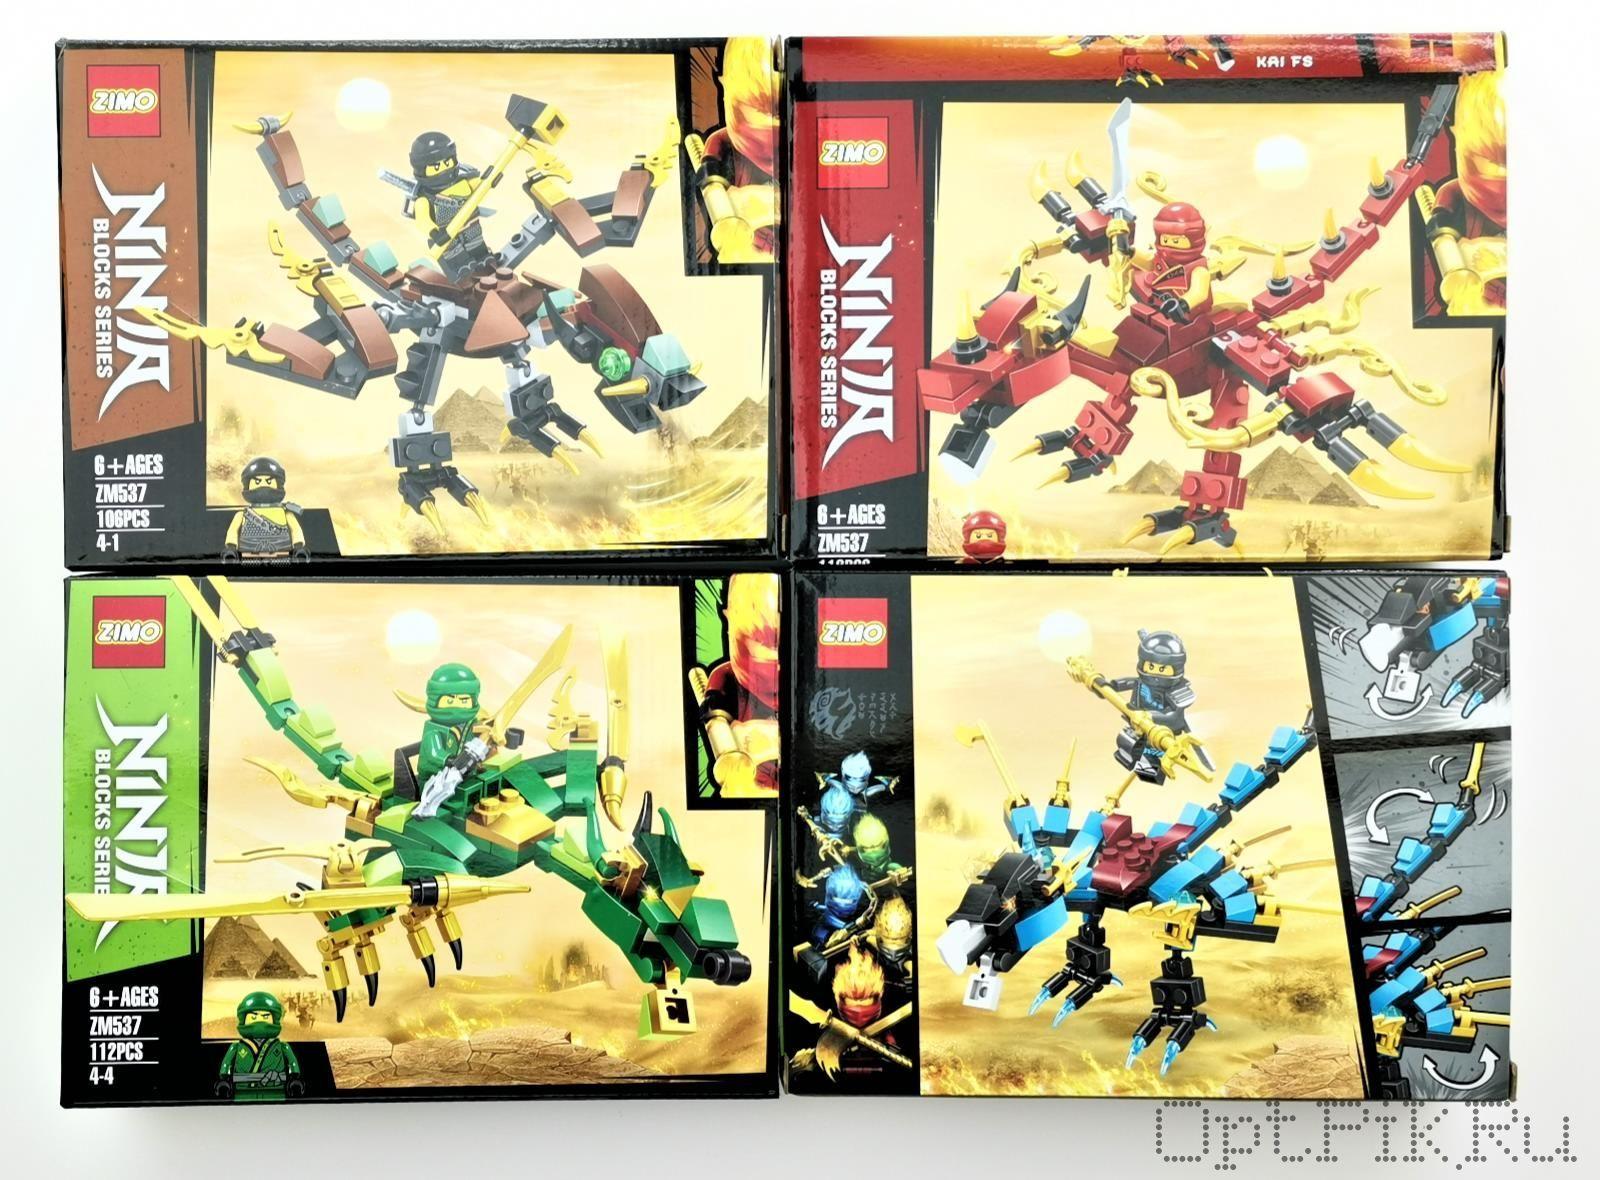 LEGO Ninjago (Ниндзя го) с драконом